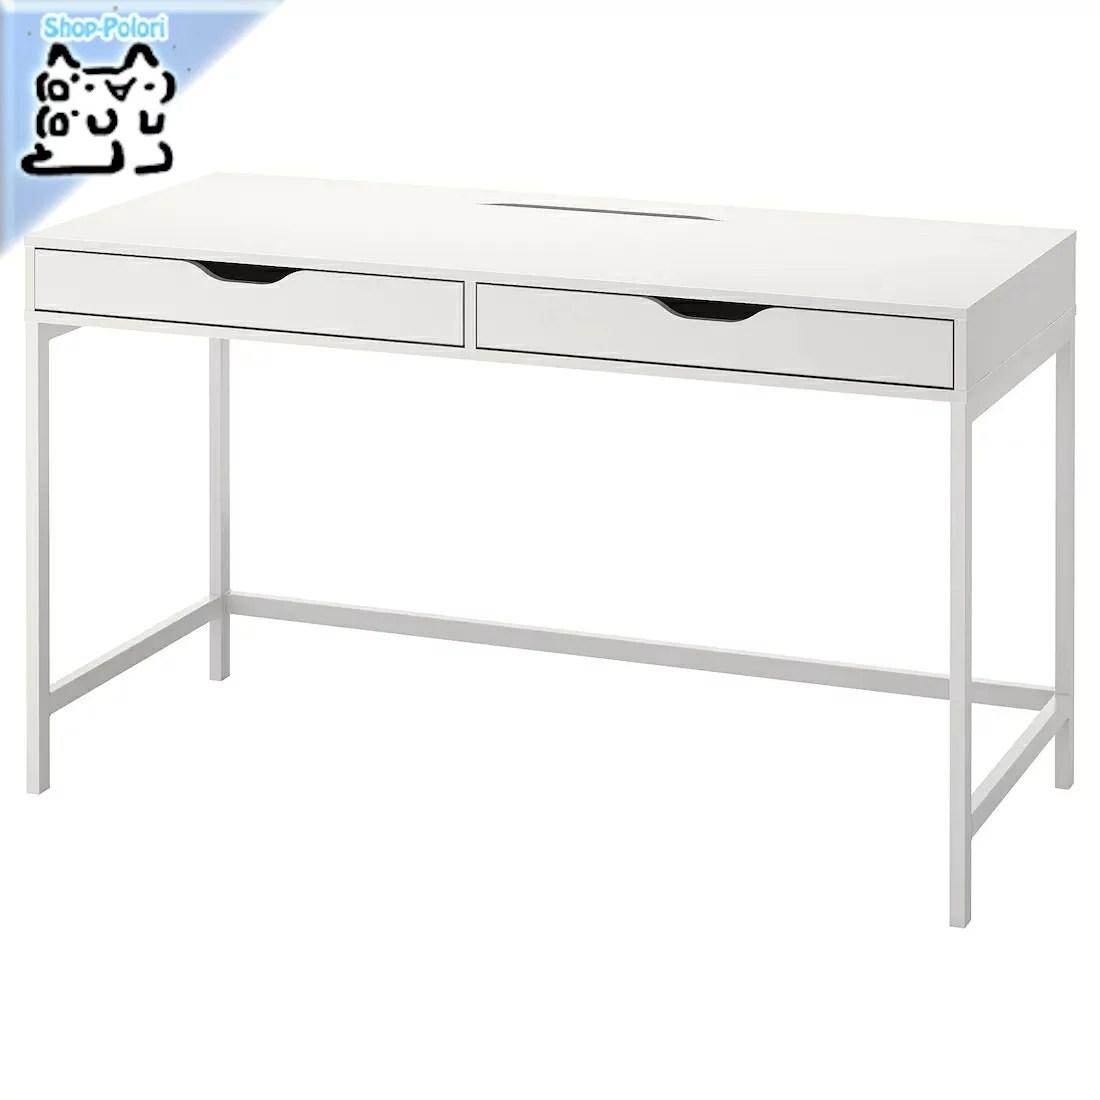 【IKEA Original】ALEX -アレクス- デスク ホワイト 132x58 cm